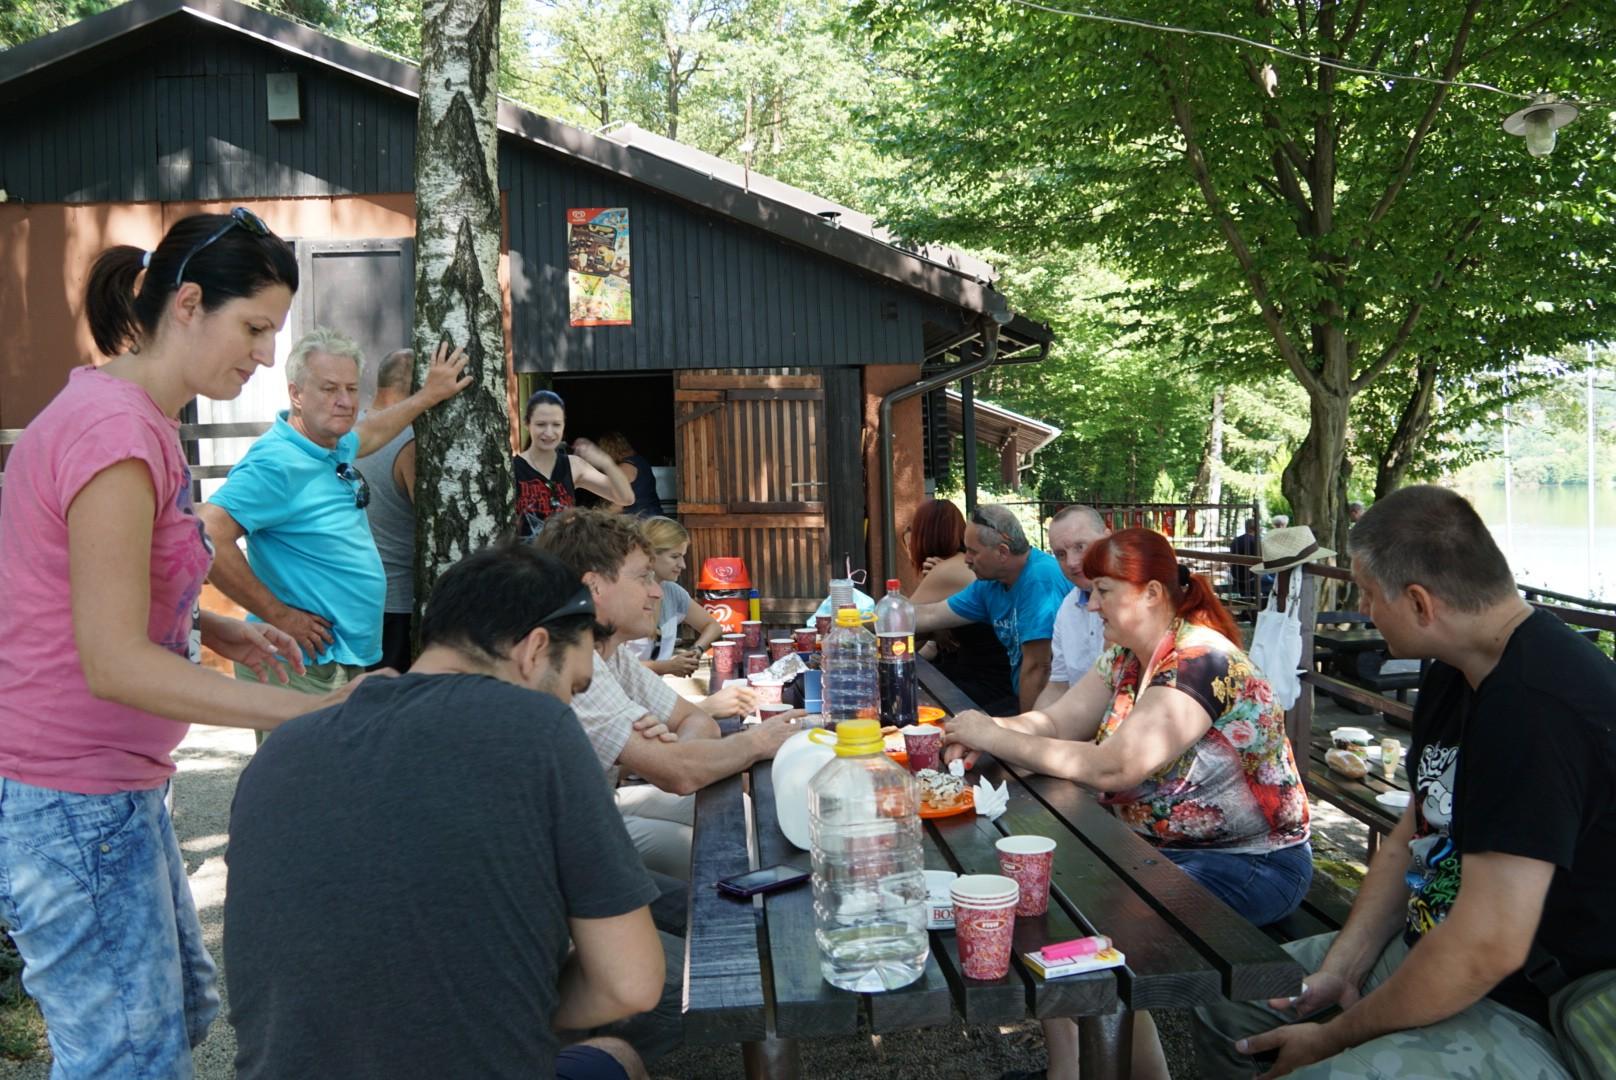 Društveni piknik ob Šmartinskem jezeru